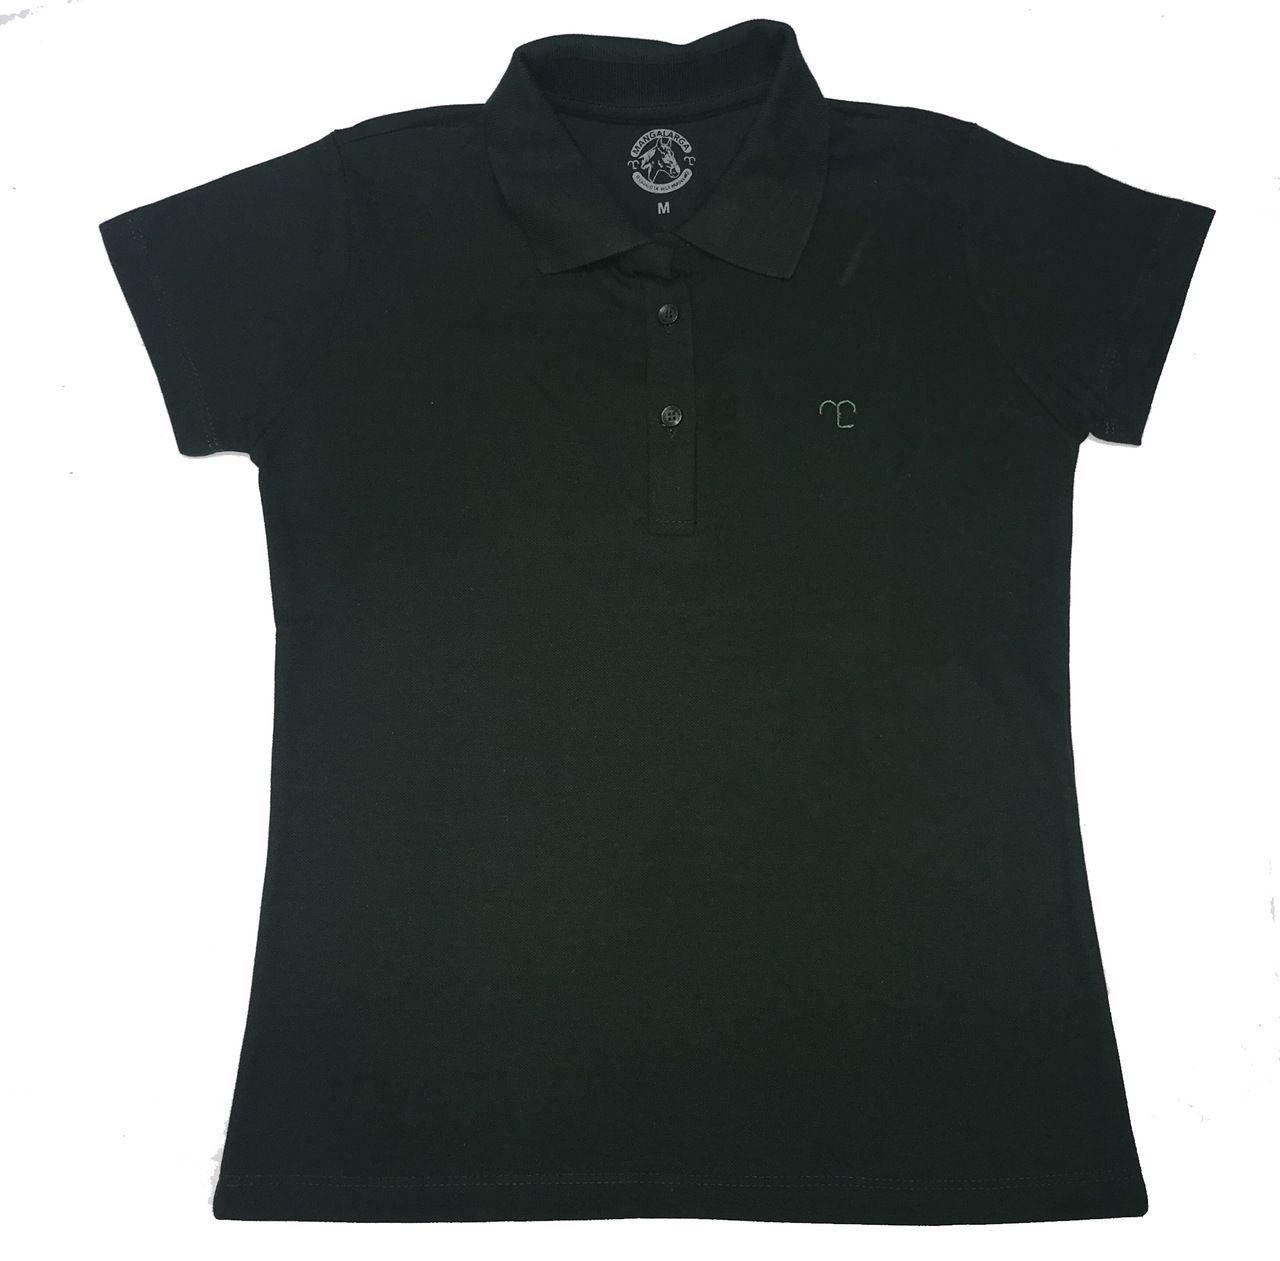 Camisa Polo Feminina Cores  - Boutique Mangalarga